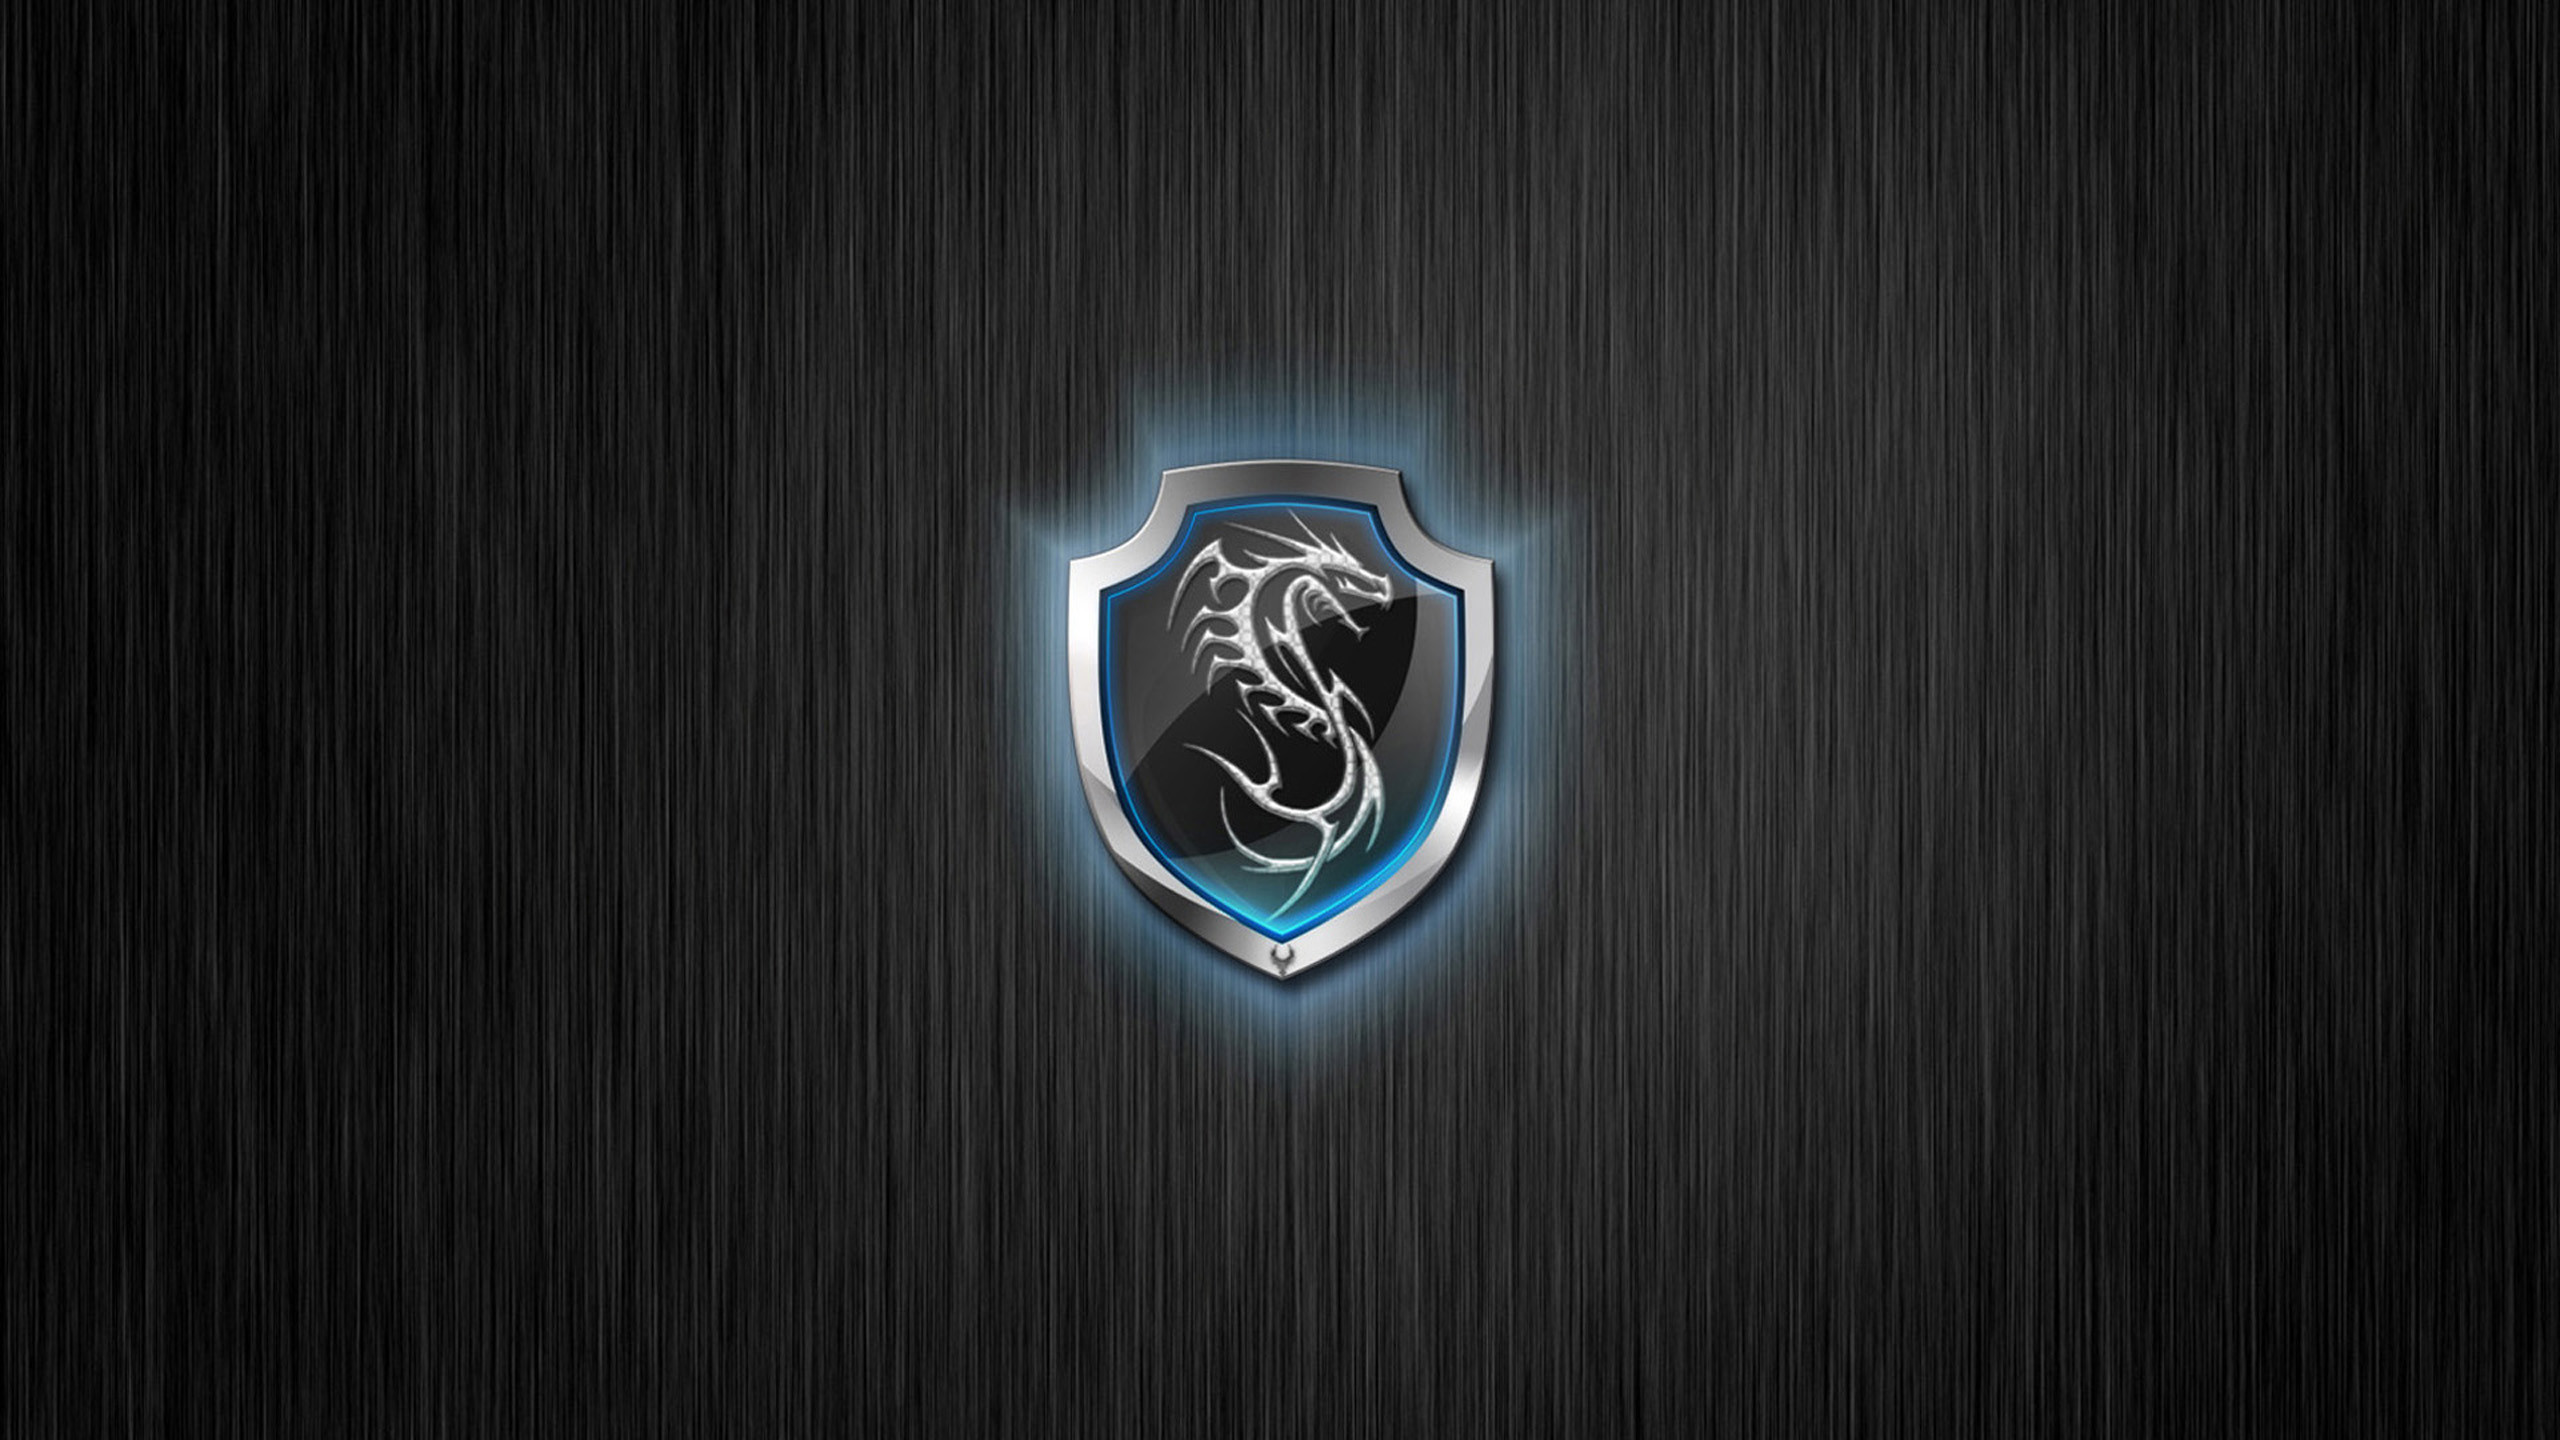 Amazing Wallpaper Logo Dragon - 895947-vertical-dragon-logo-wallpaper-2560x1440-ios  Pic_227367.jpg